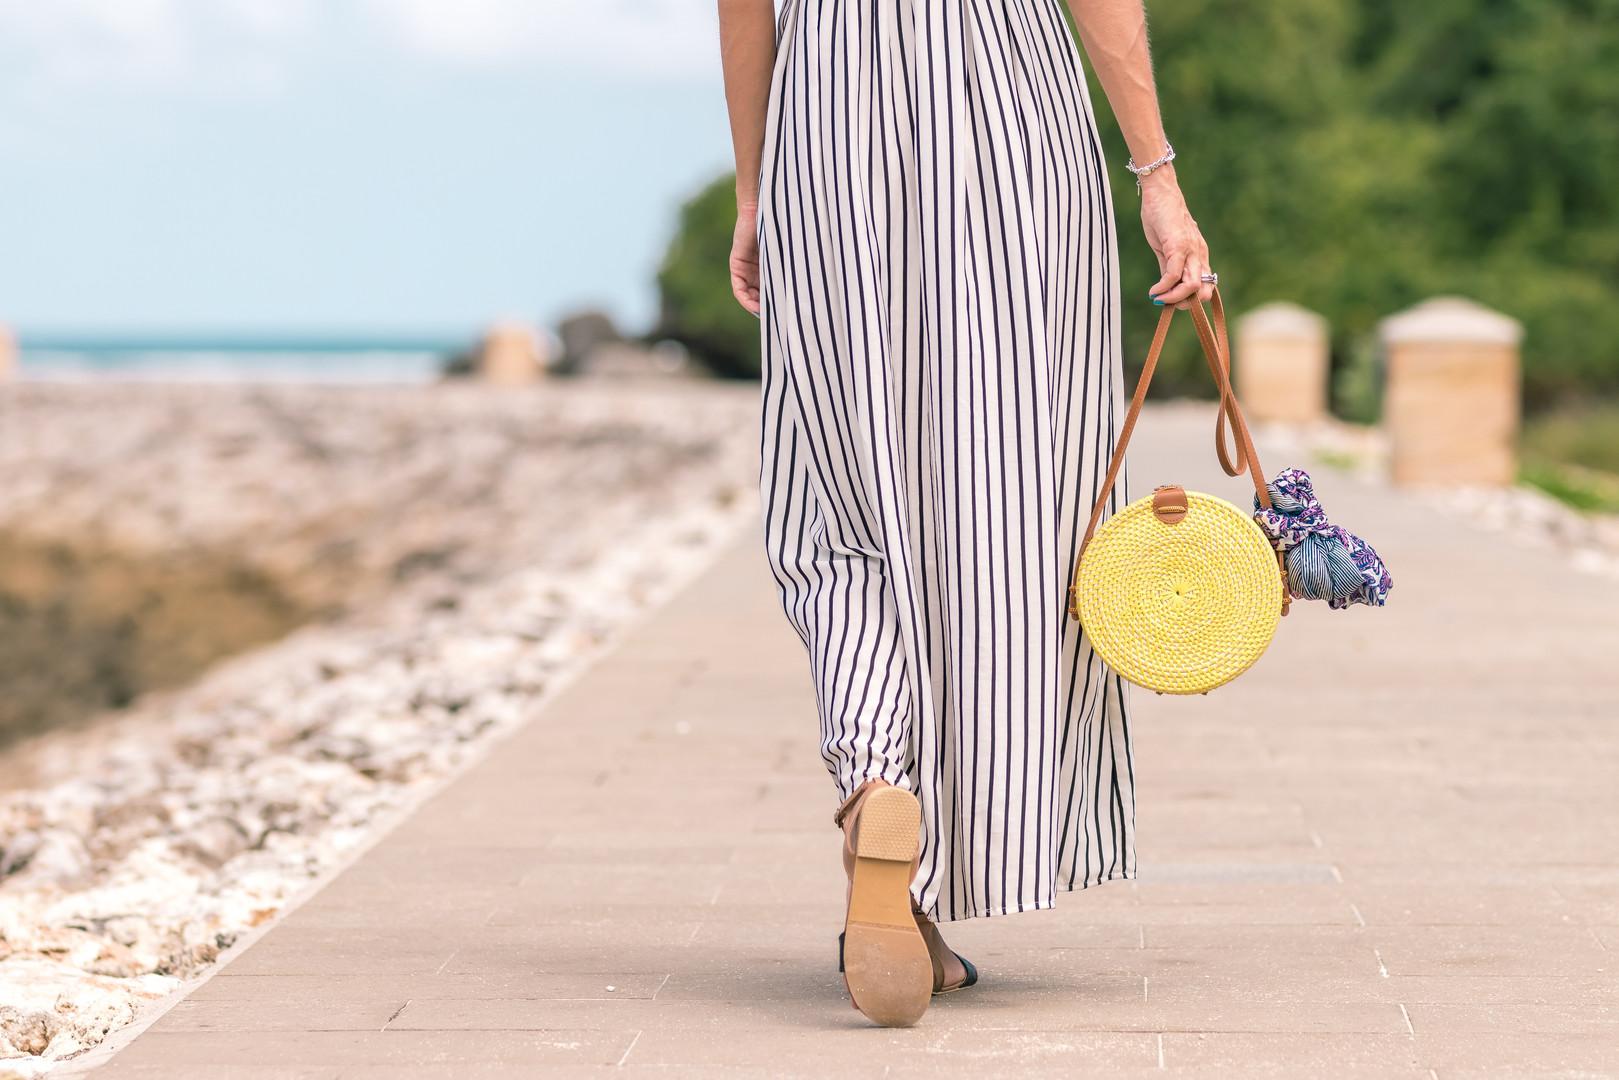 accessories-bag-bright-1100790.jpg